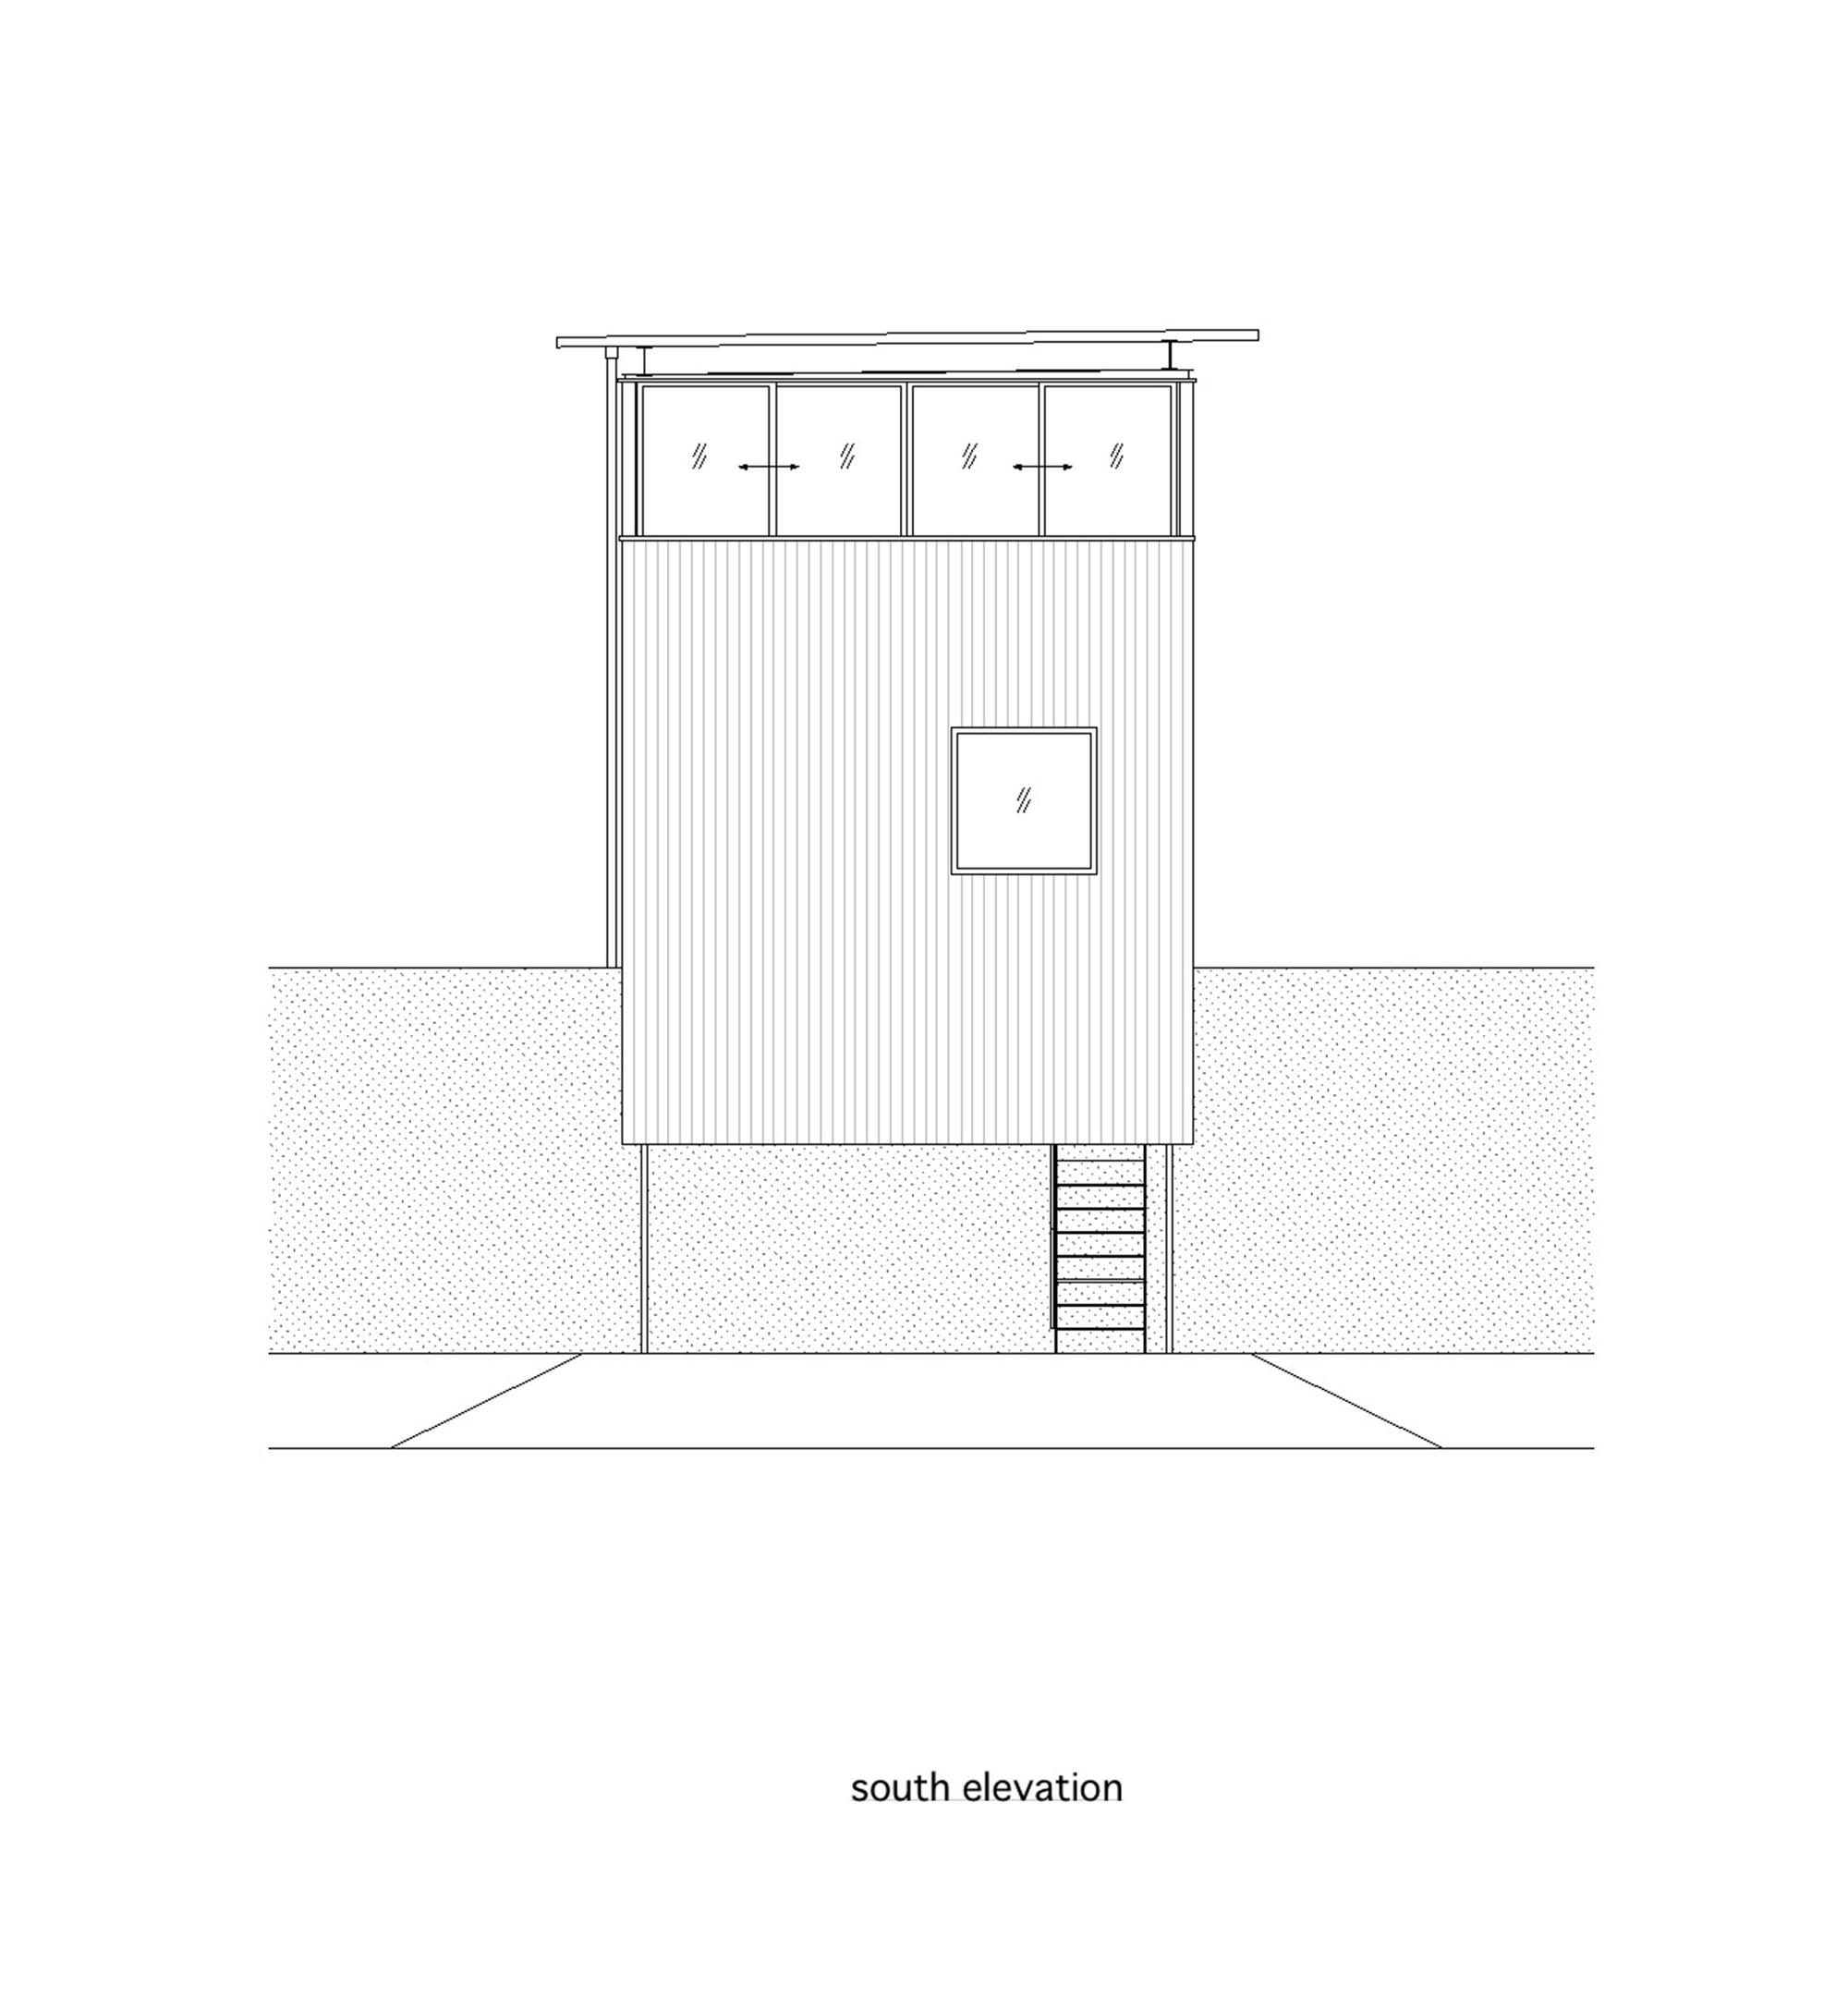 540ea193c07a80b90600014f_house-in-miyake-hidetaka-nakahara-architects-yoshio-ohno-architects_south_elevation